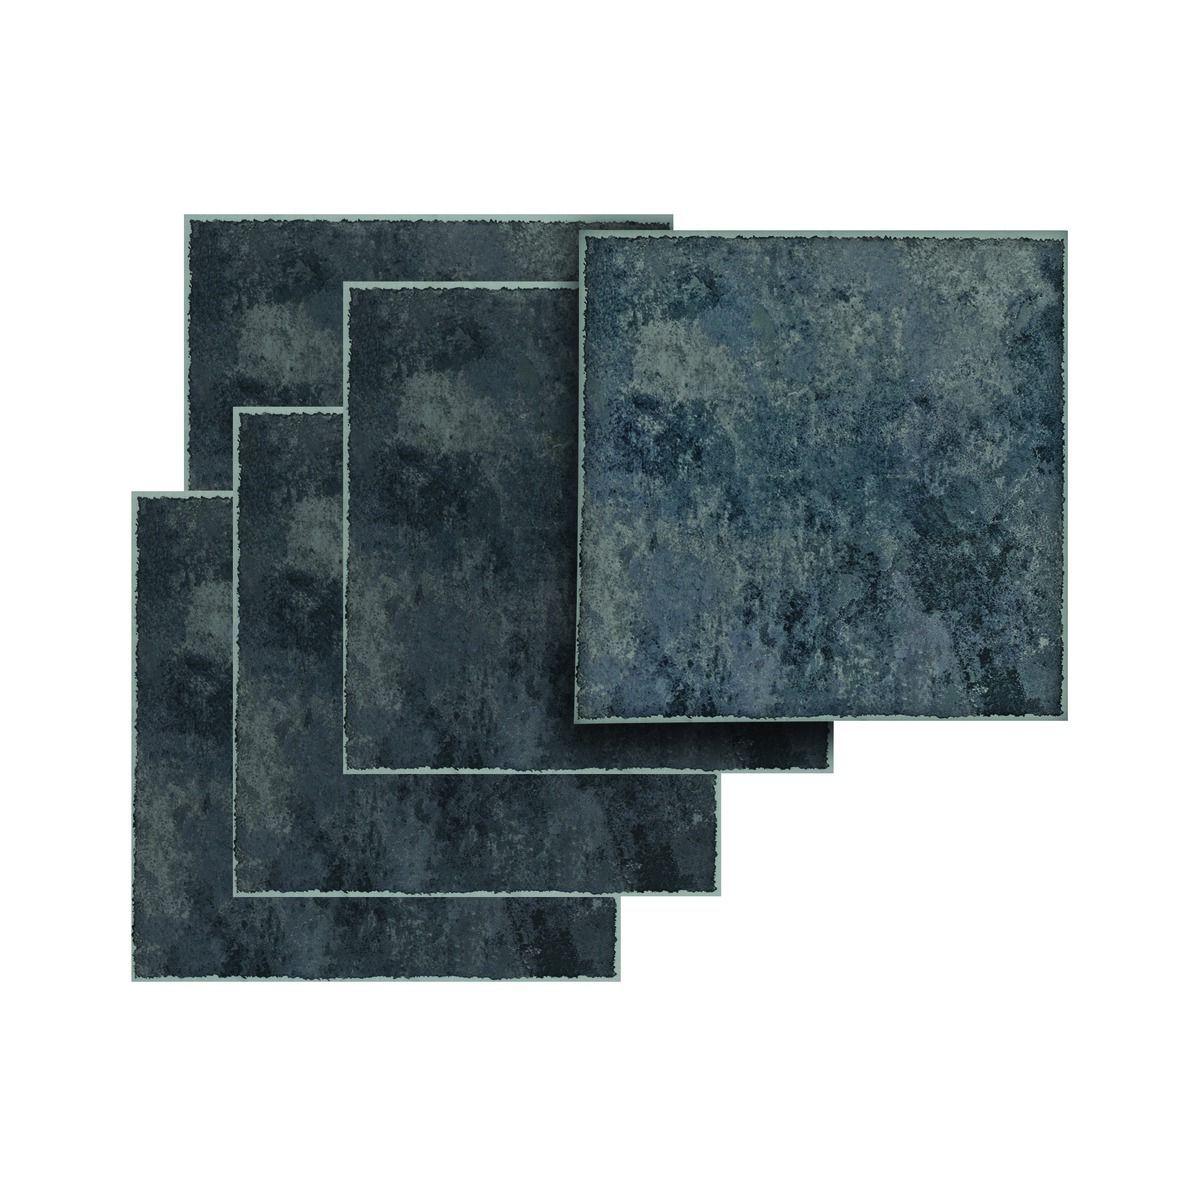 Wickes Vinyl Tiles Black Slate 305 x 305mm 11 Pack